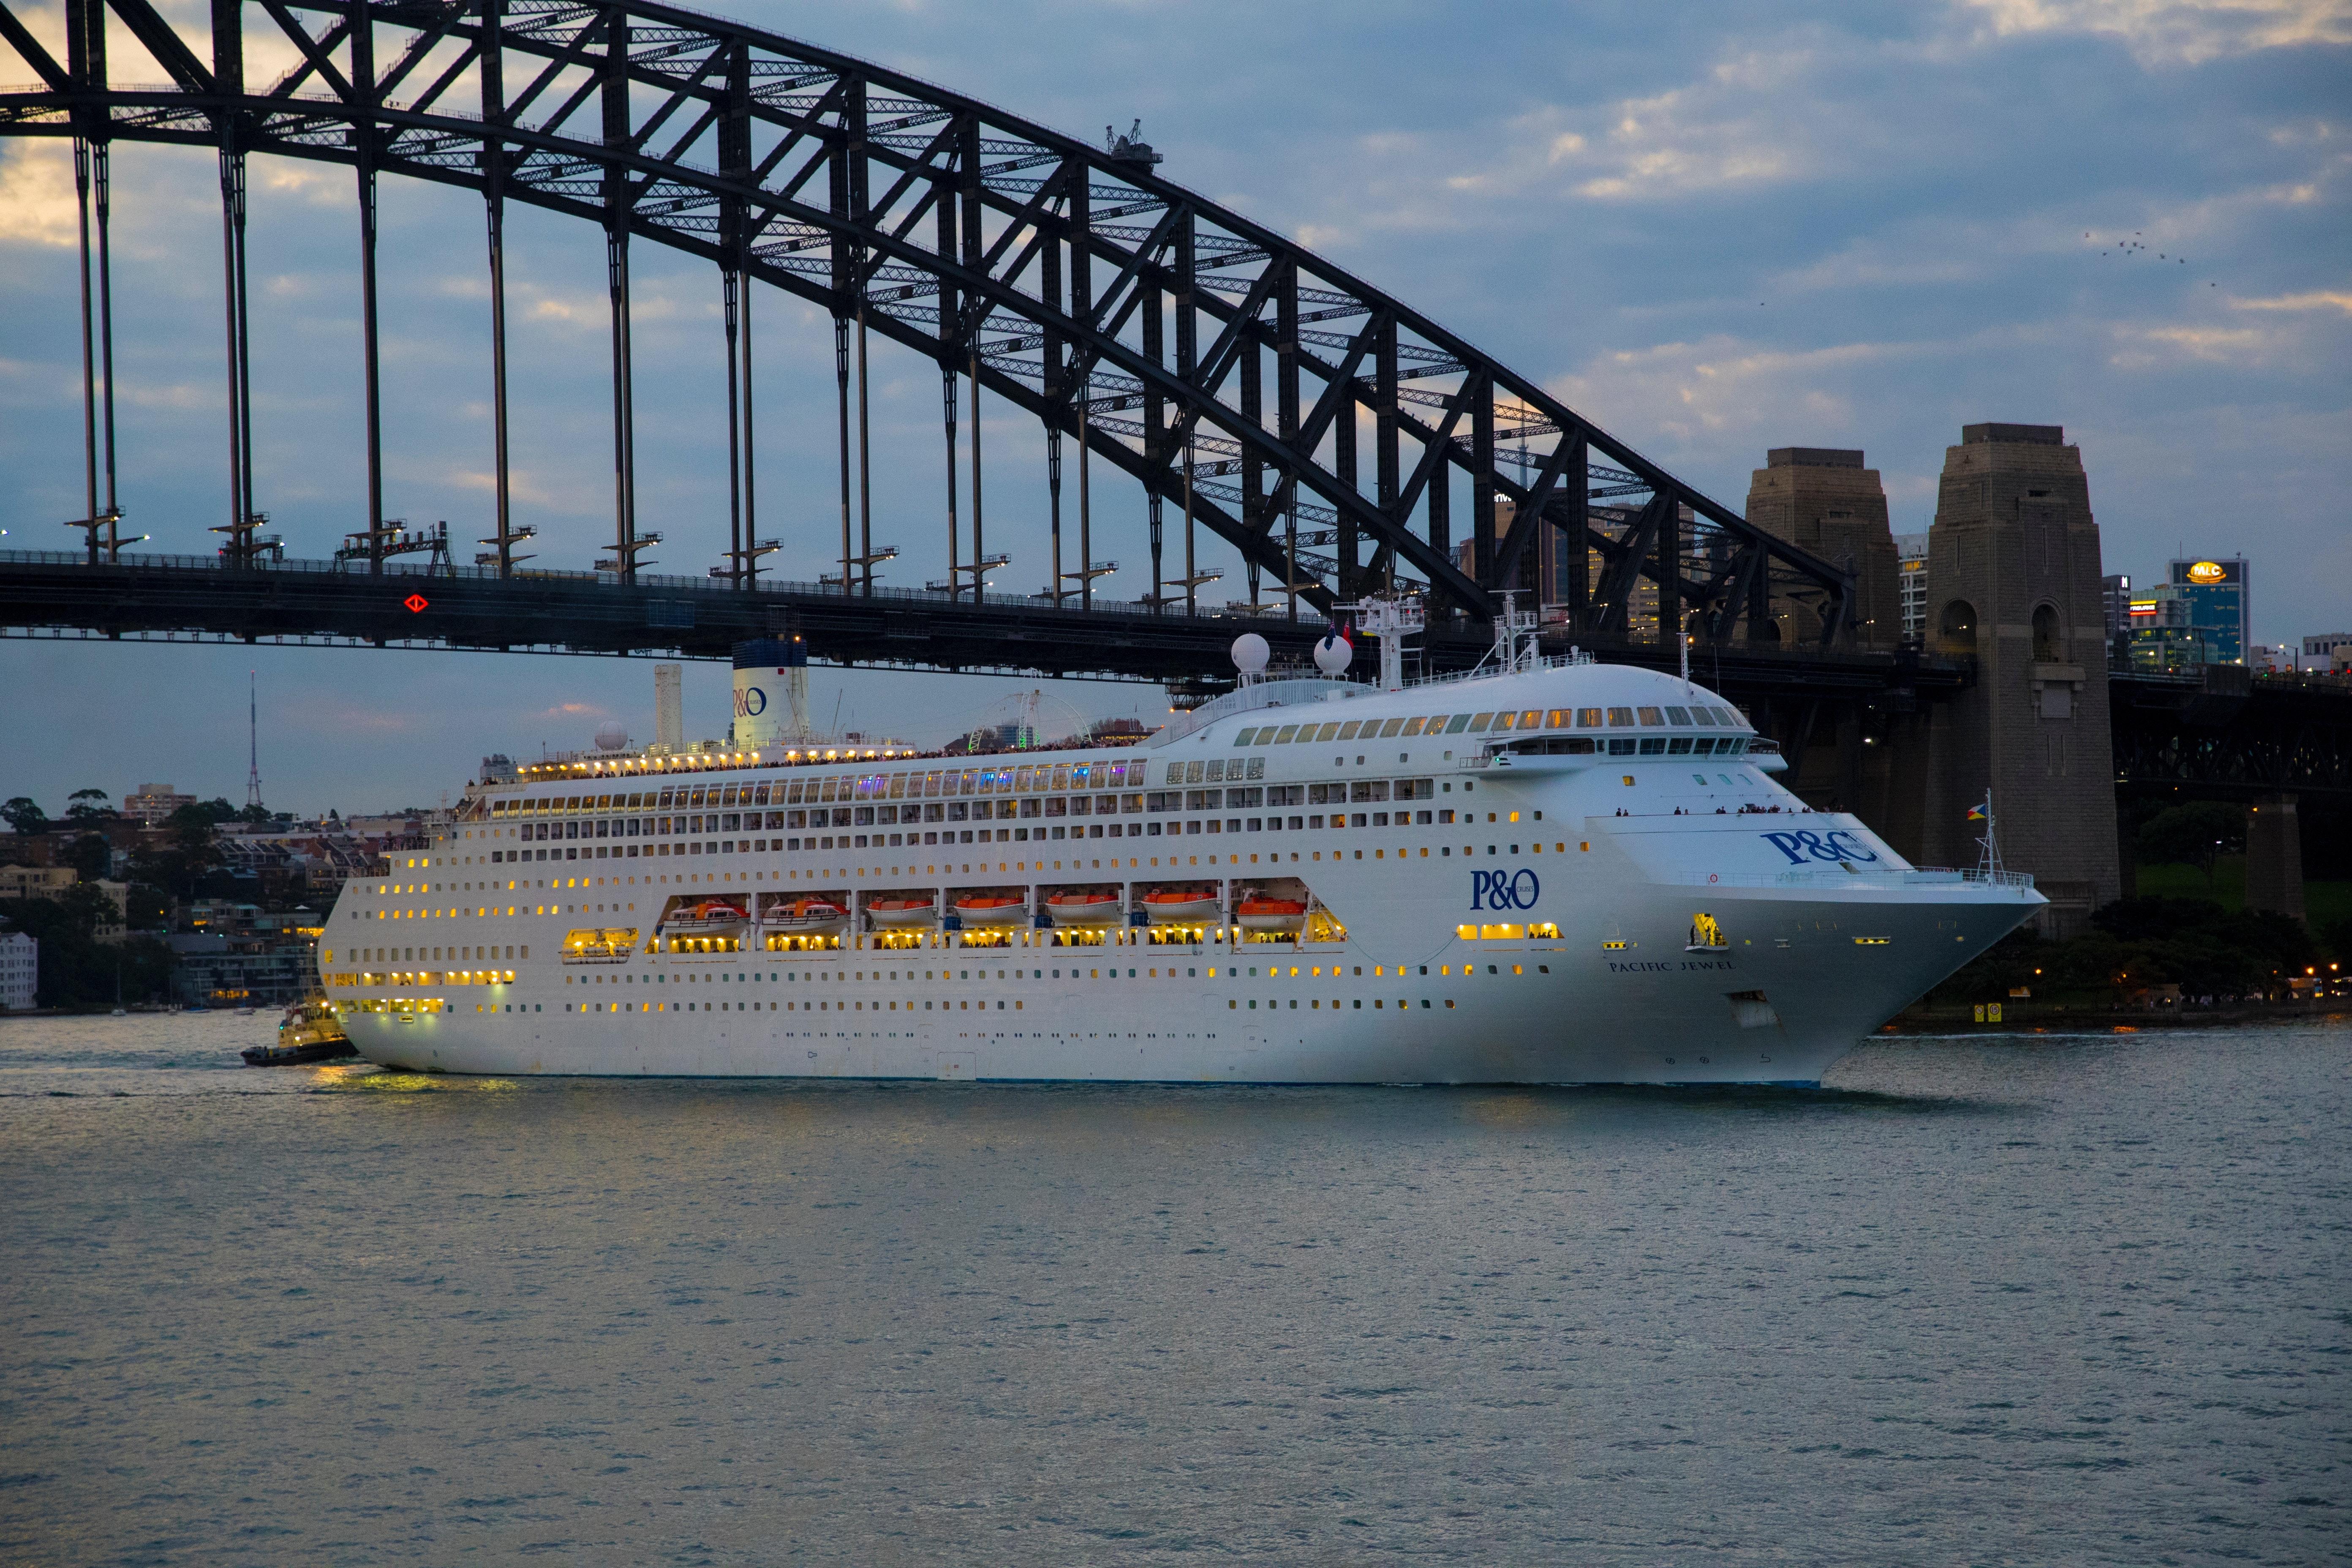 retirement cruise ship